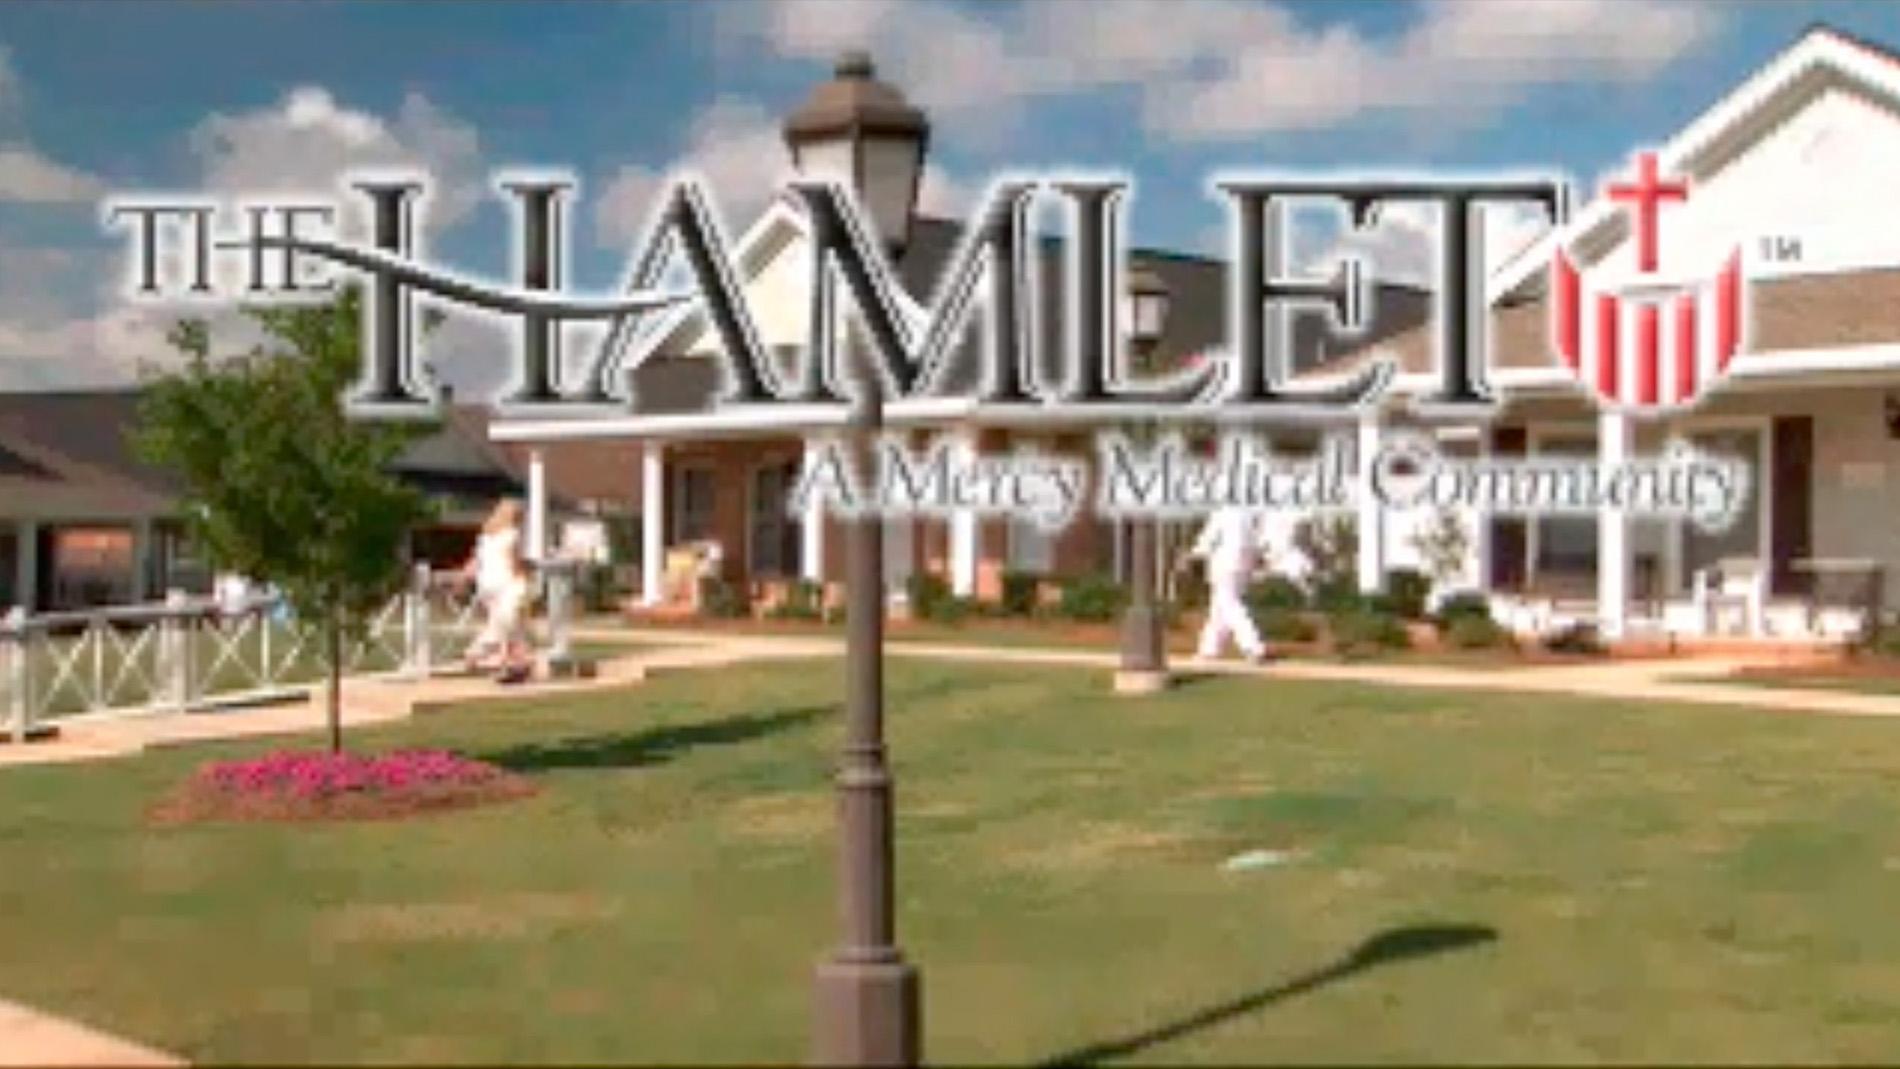 The Hamlet TV Commercial